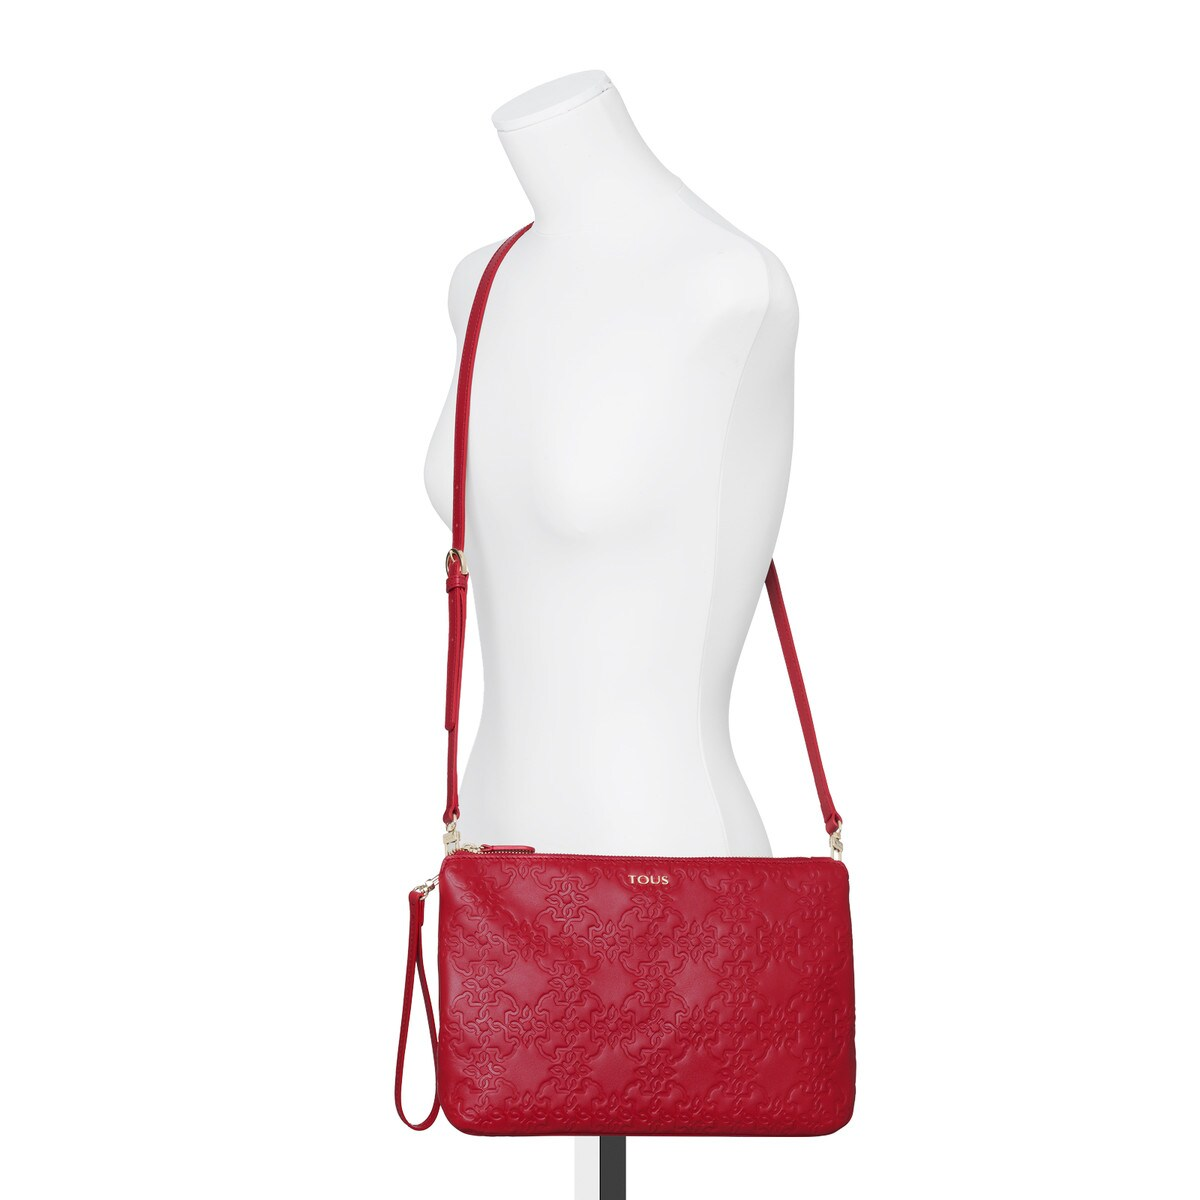 a4a421e457 Τσάντα χιαστί μεγάλου μεγέθους Mossaic από Δέρμα σε κόκκινο χρώμα ...